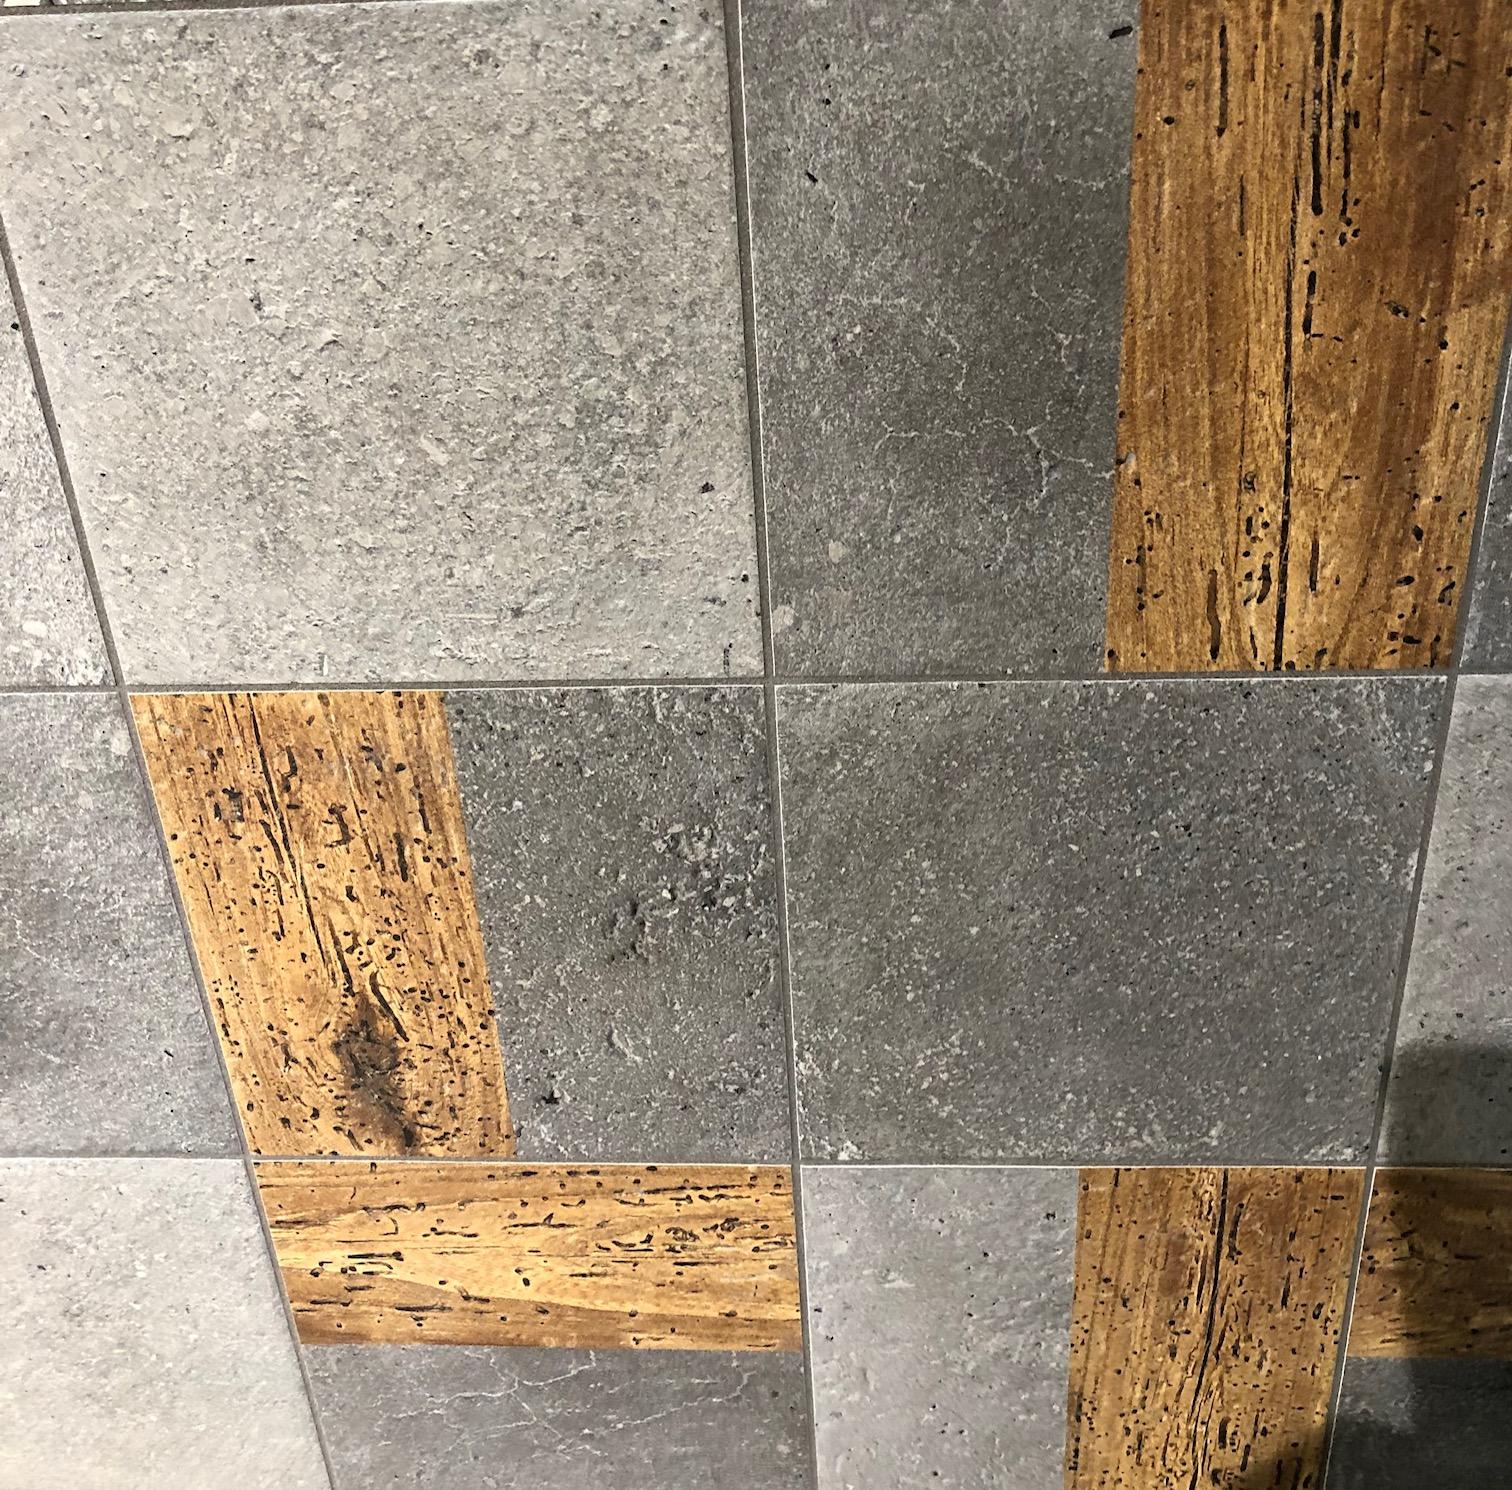 Wood and Concrete, Ceramics of Italy